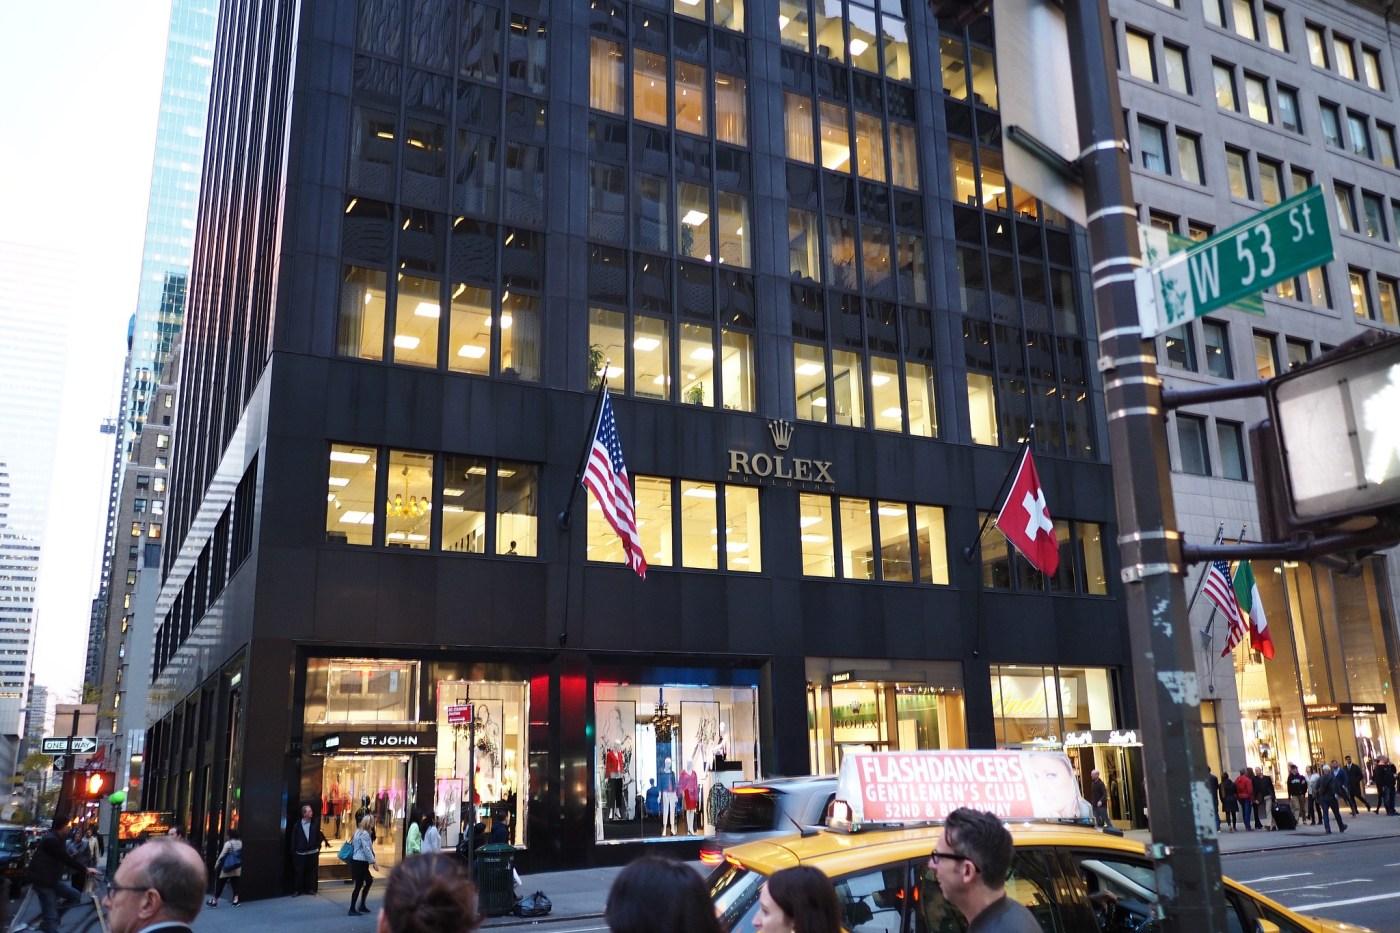 Rolex current Headquarters at 665 Fifth Avenue